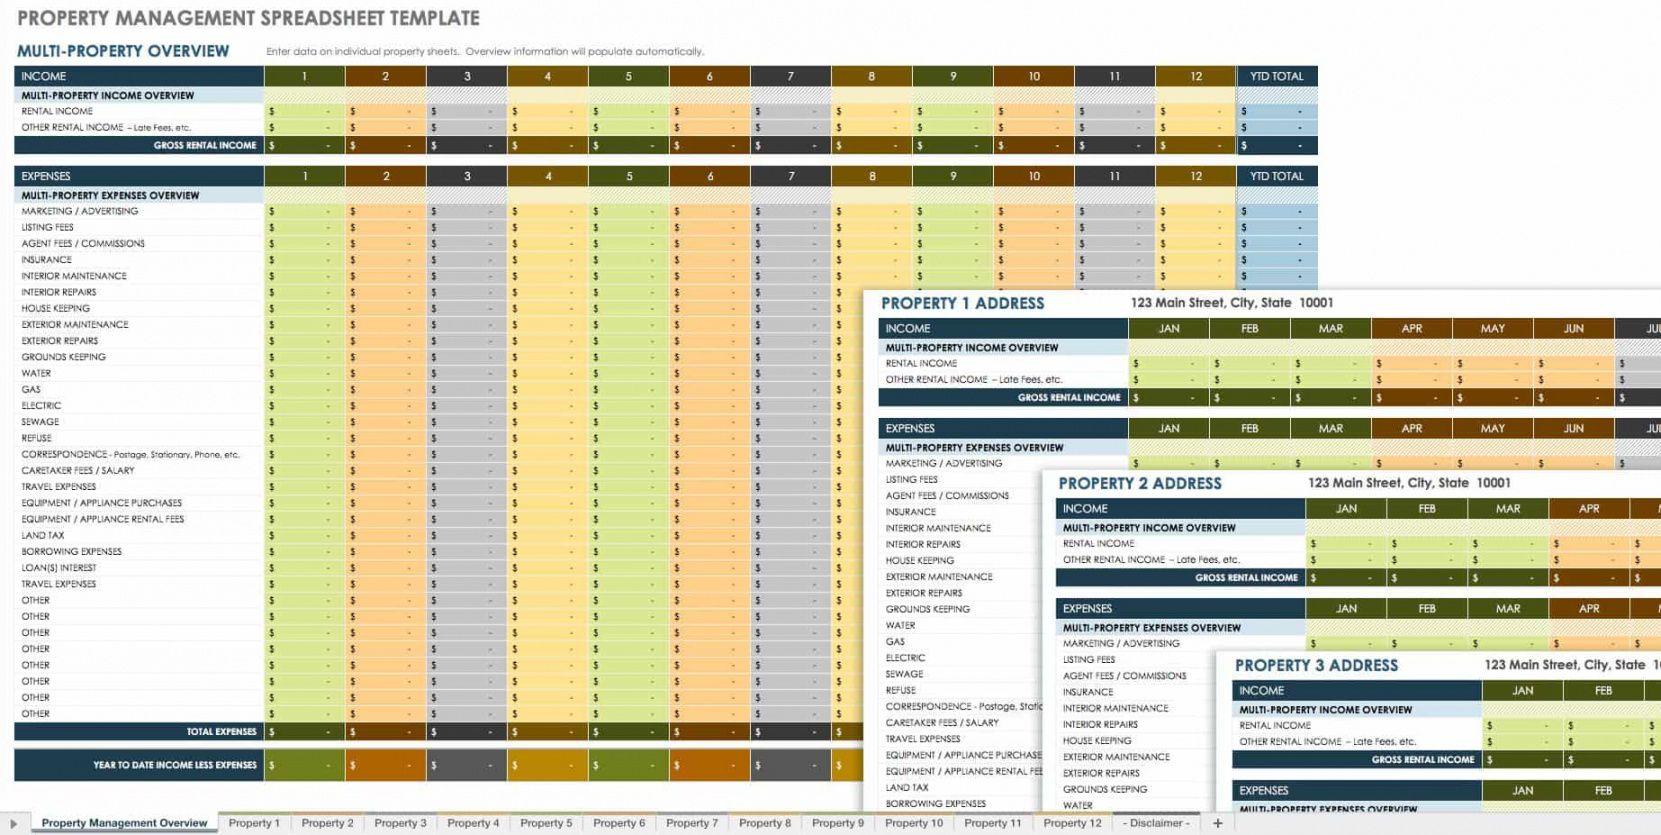 18 free property management templates  smartsheet facilities management budget template doc